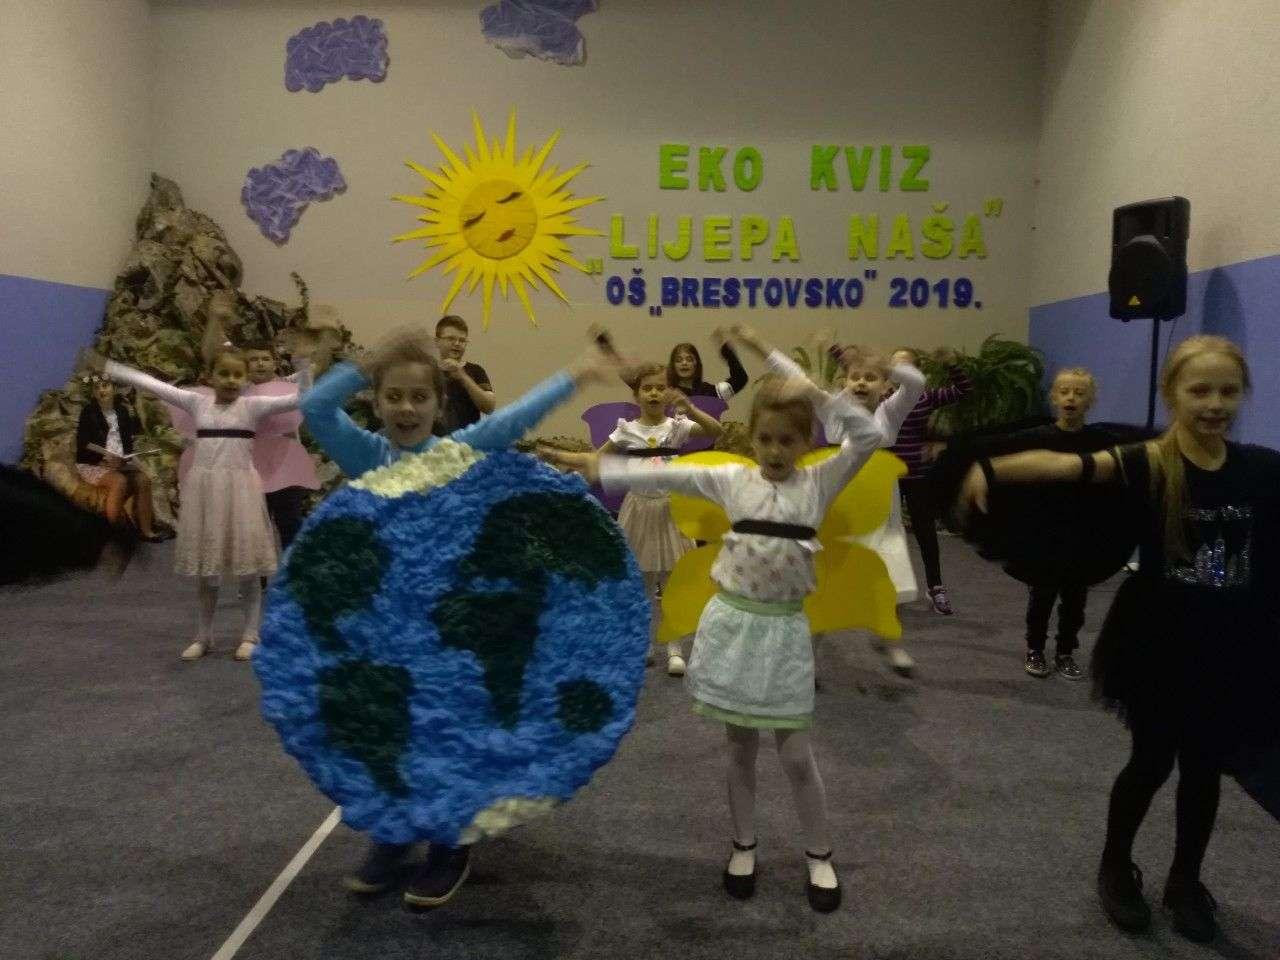 SBK: Ekološki kviz ''Lijepa naša'' 2019 - razredna nastava